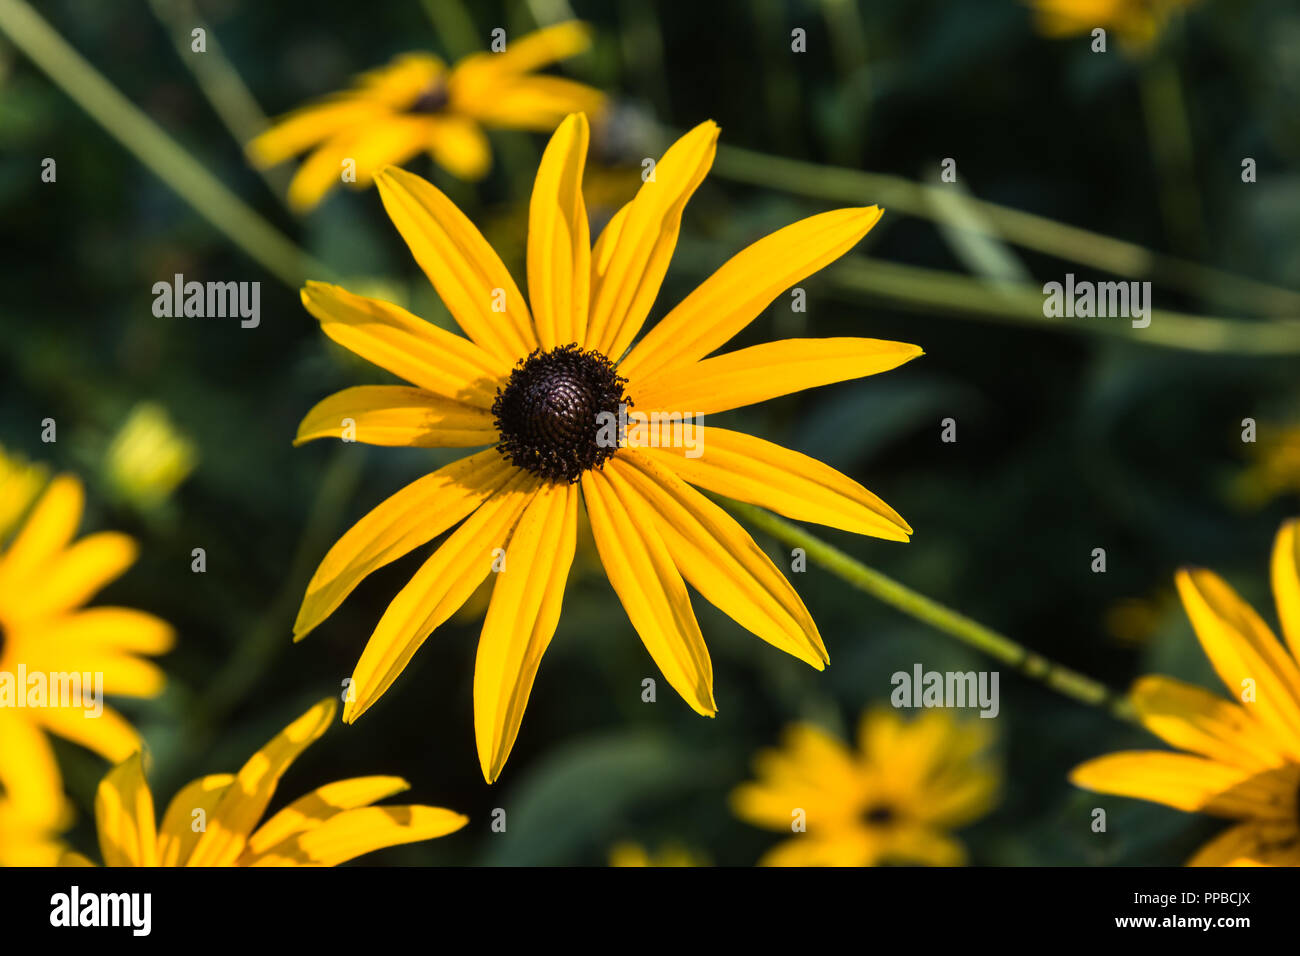 Daisy Like Flower Stock Photos Daisy Like Flower Stock Images Alamy